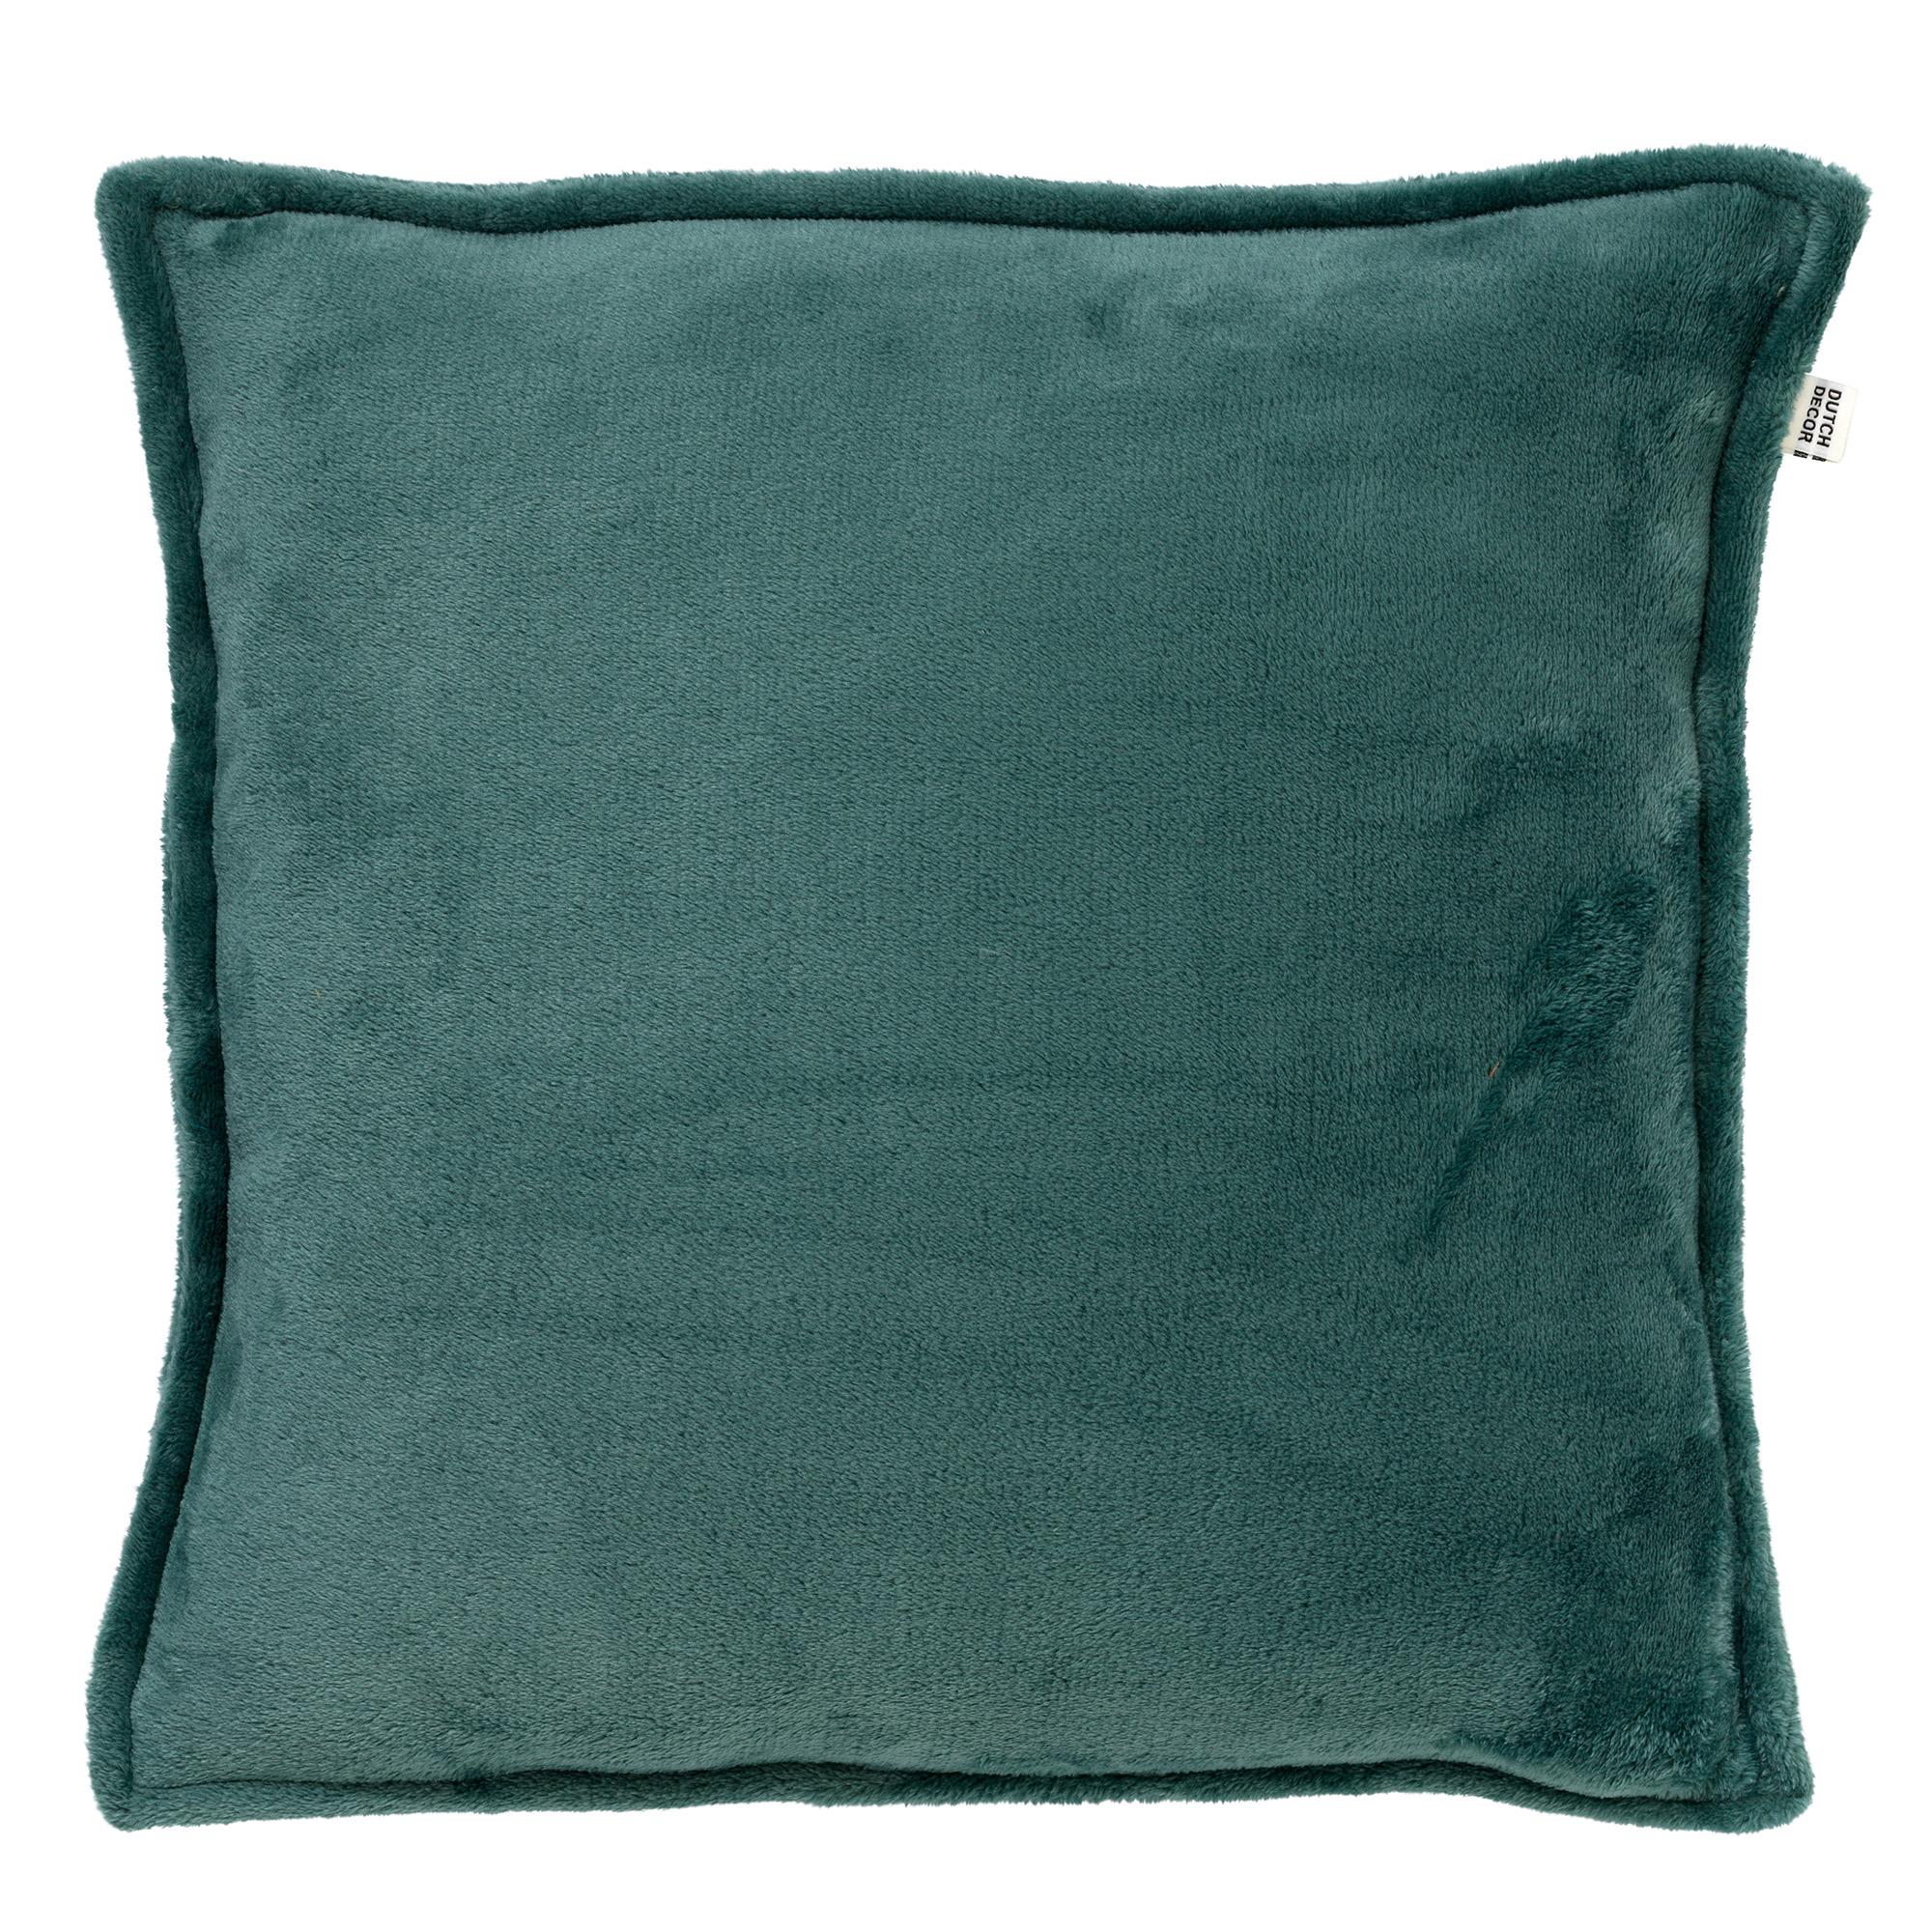 CILLY - Sierkussen van fleece Sagebrush Green 45x45 cm